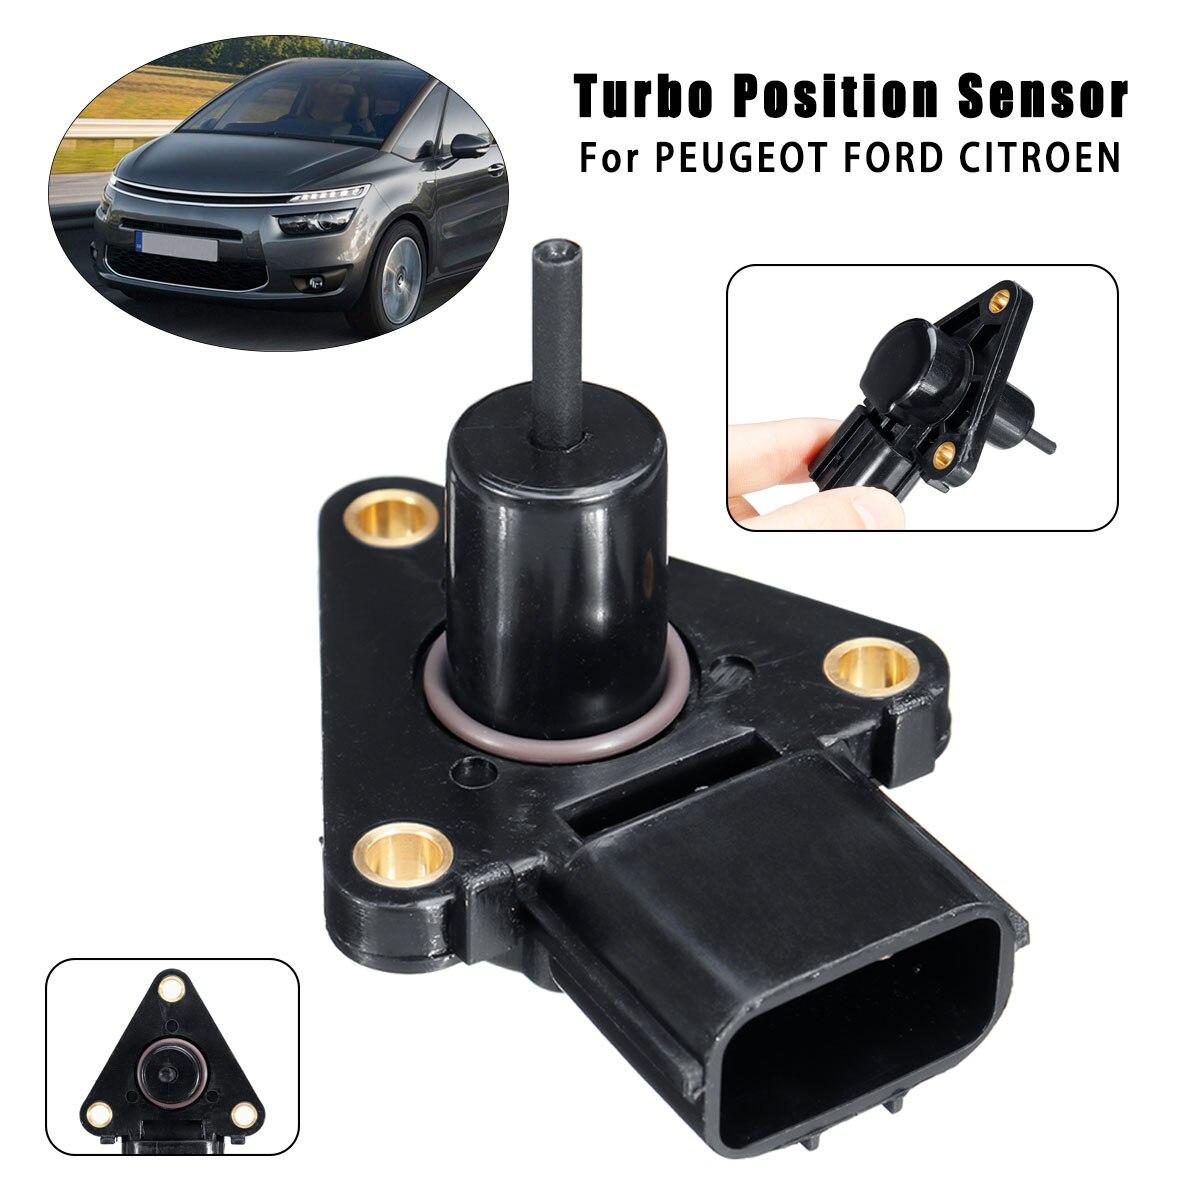 Turbo Ladegerät Antrieb Position Sensor Für Peugeot/Ford/Citroen 0375K1 0375K8